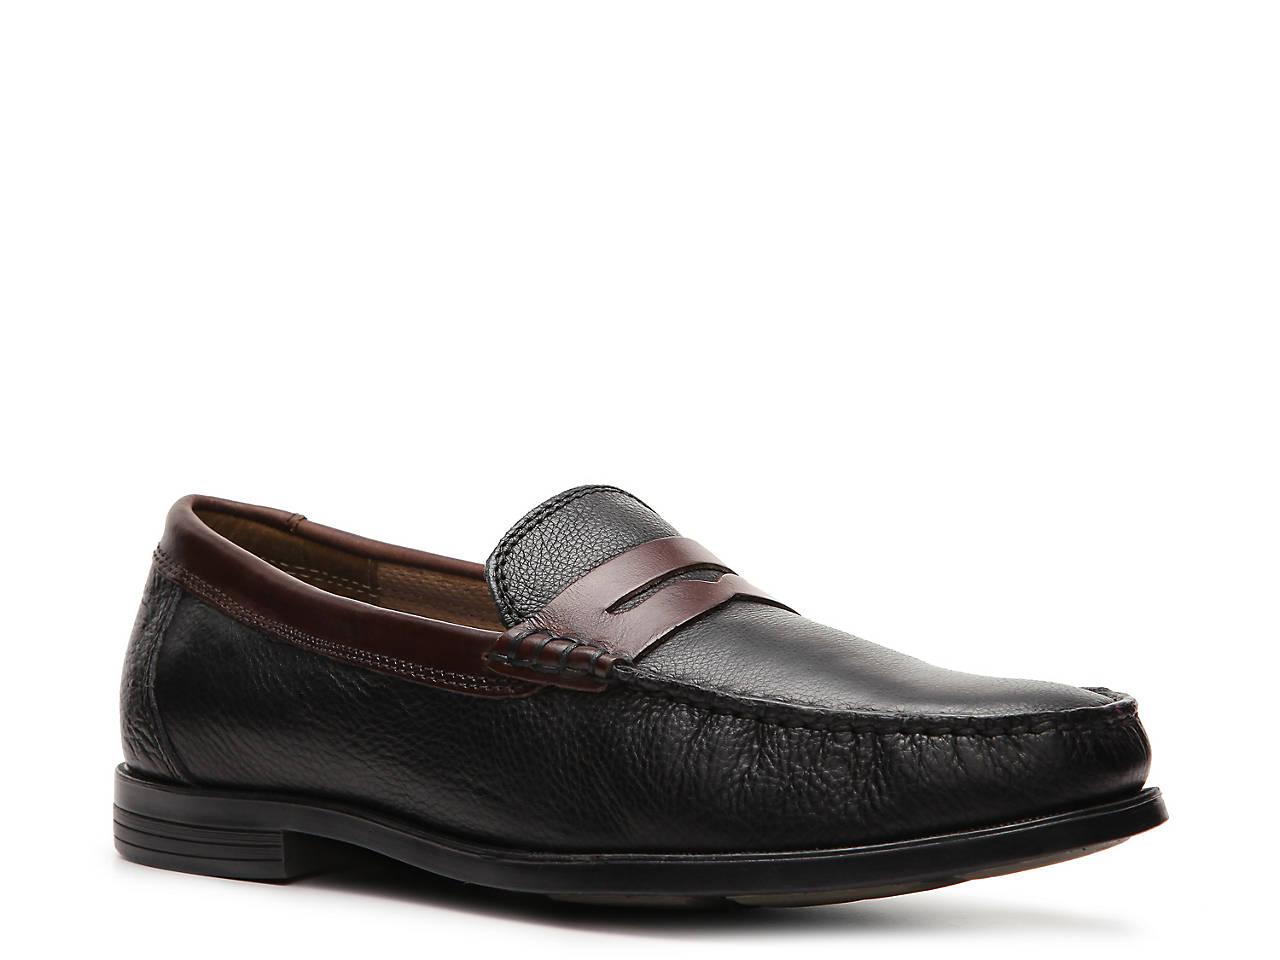 b028ae44990 Florsheim Cricket Penny Loafer Men s Shoes